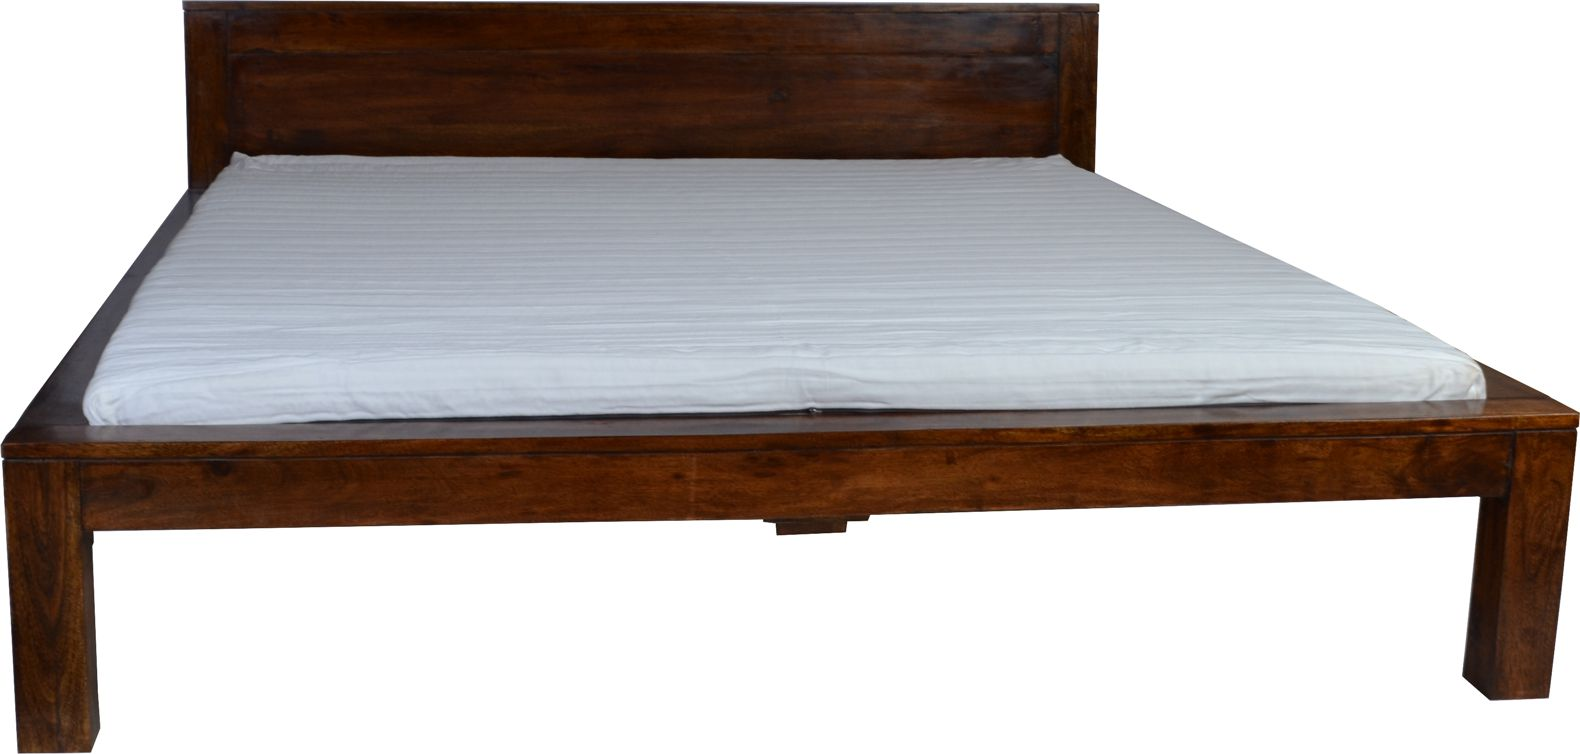 bett ashoka massivholz m bel akazie walnuss 20568 ebay. Black Bedroom Furniture Sets. Home Design Ideas